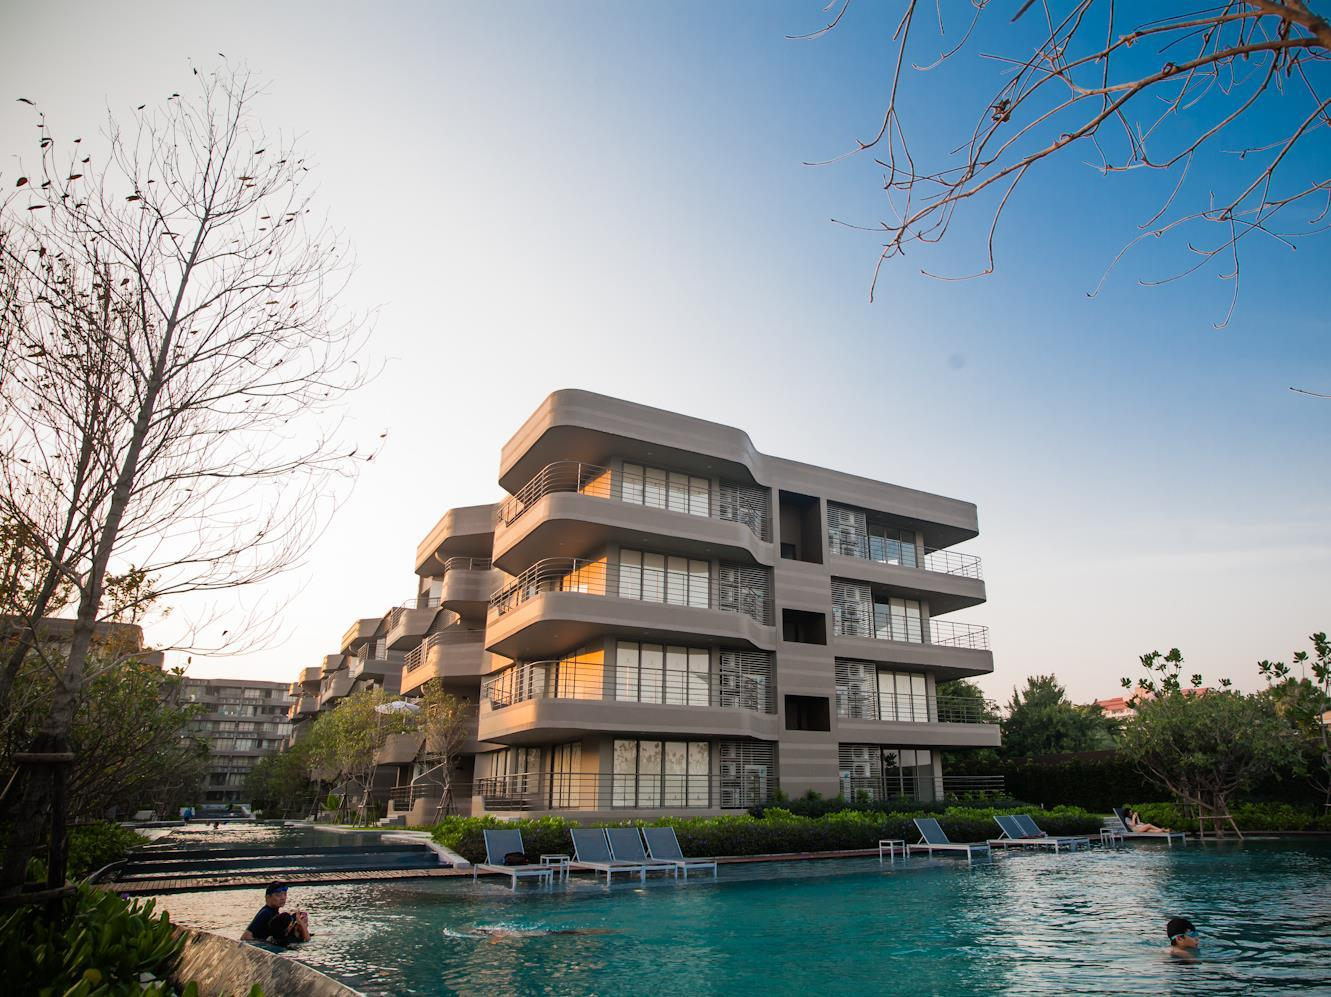 Hua Hin Cha Am Hotels Reservation